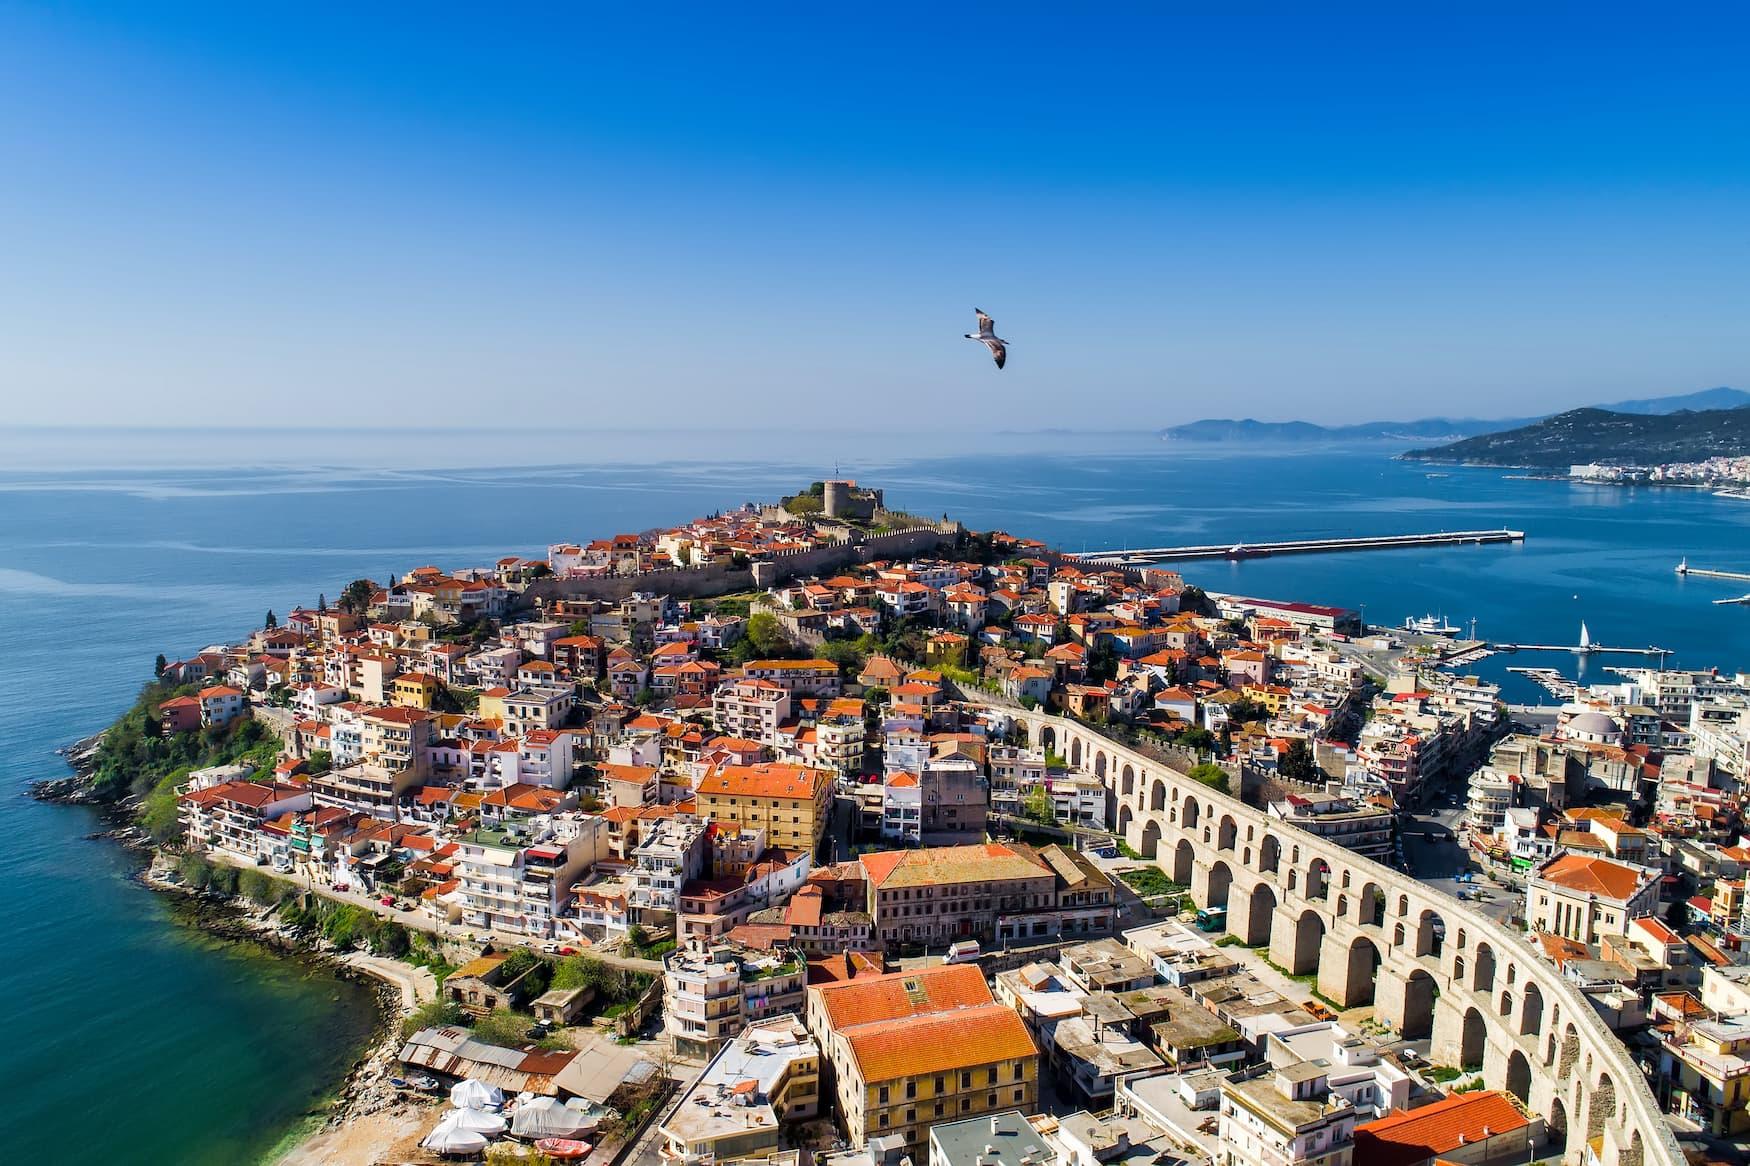 Kavala in Nordgriechenland gehört zu den Griechenland Geheimtipps